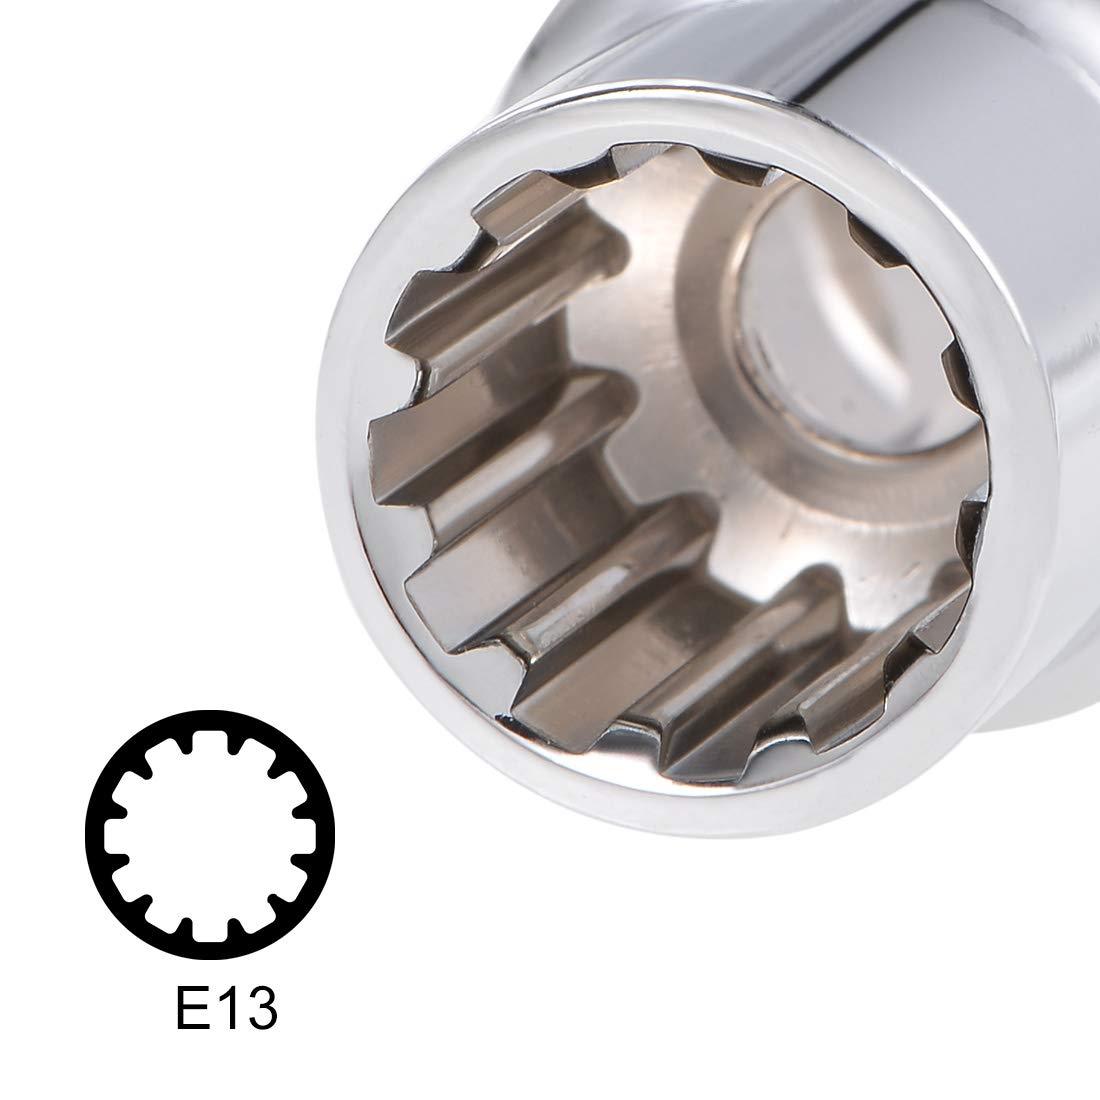 uxcell 1//2-inch Drive E20 Universal Spline Socket Shallow 12 Point Cr-V Steel